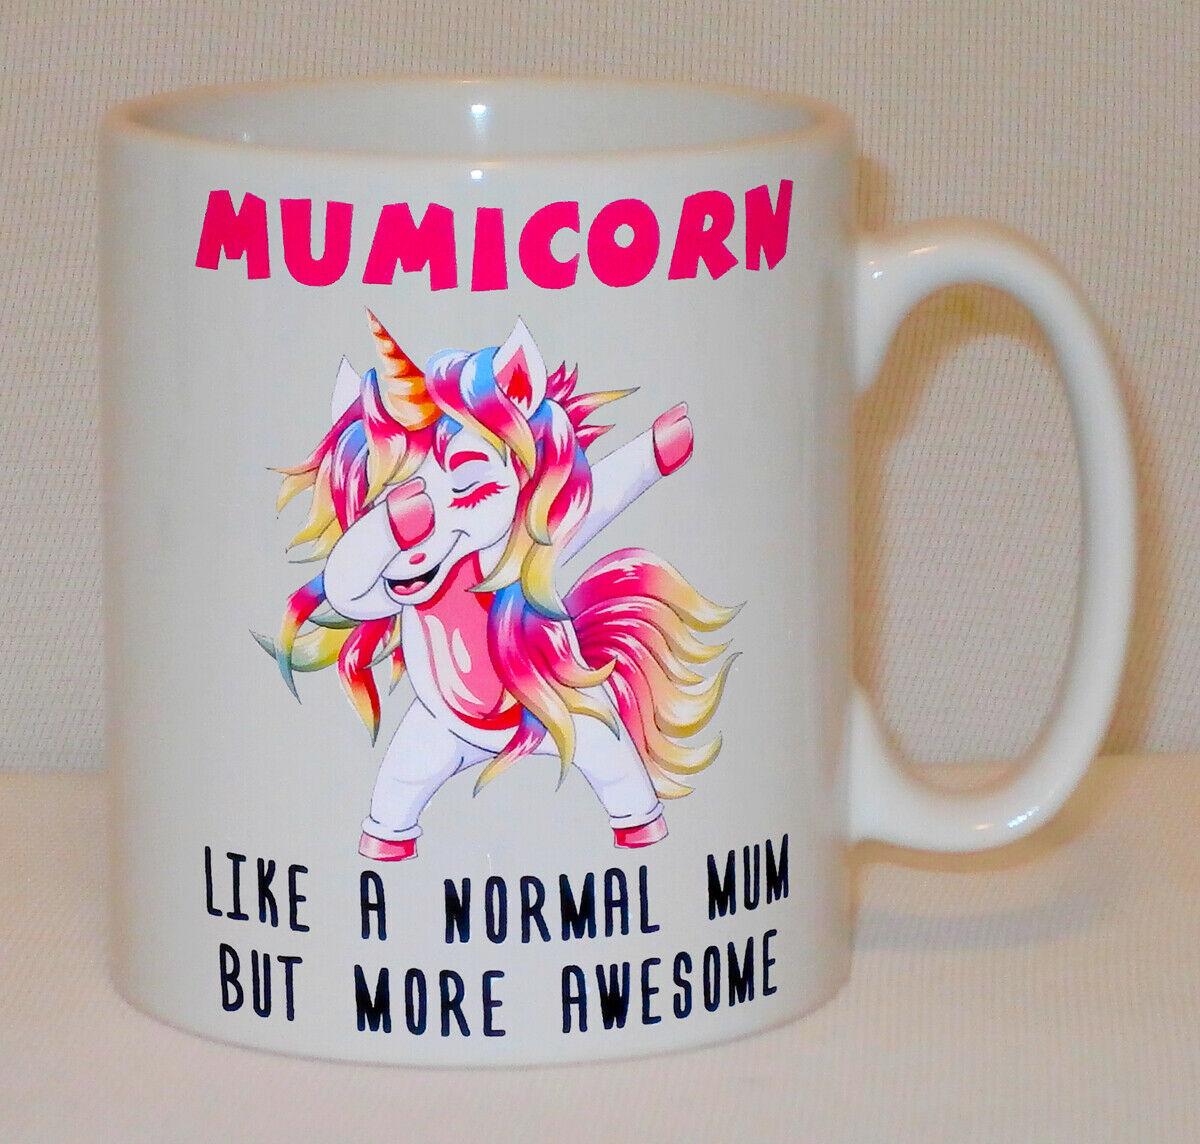 Mumicorn Unicorn Mug Can Personalise Funny Awesome Mum Mummy Mom Christmas Gift